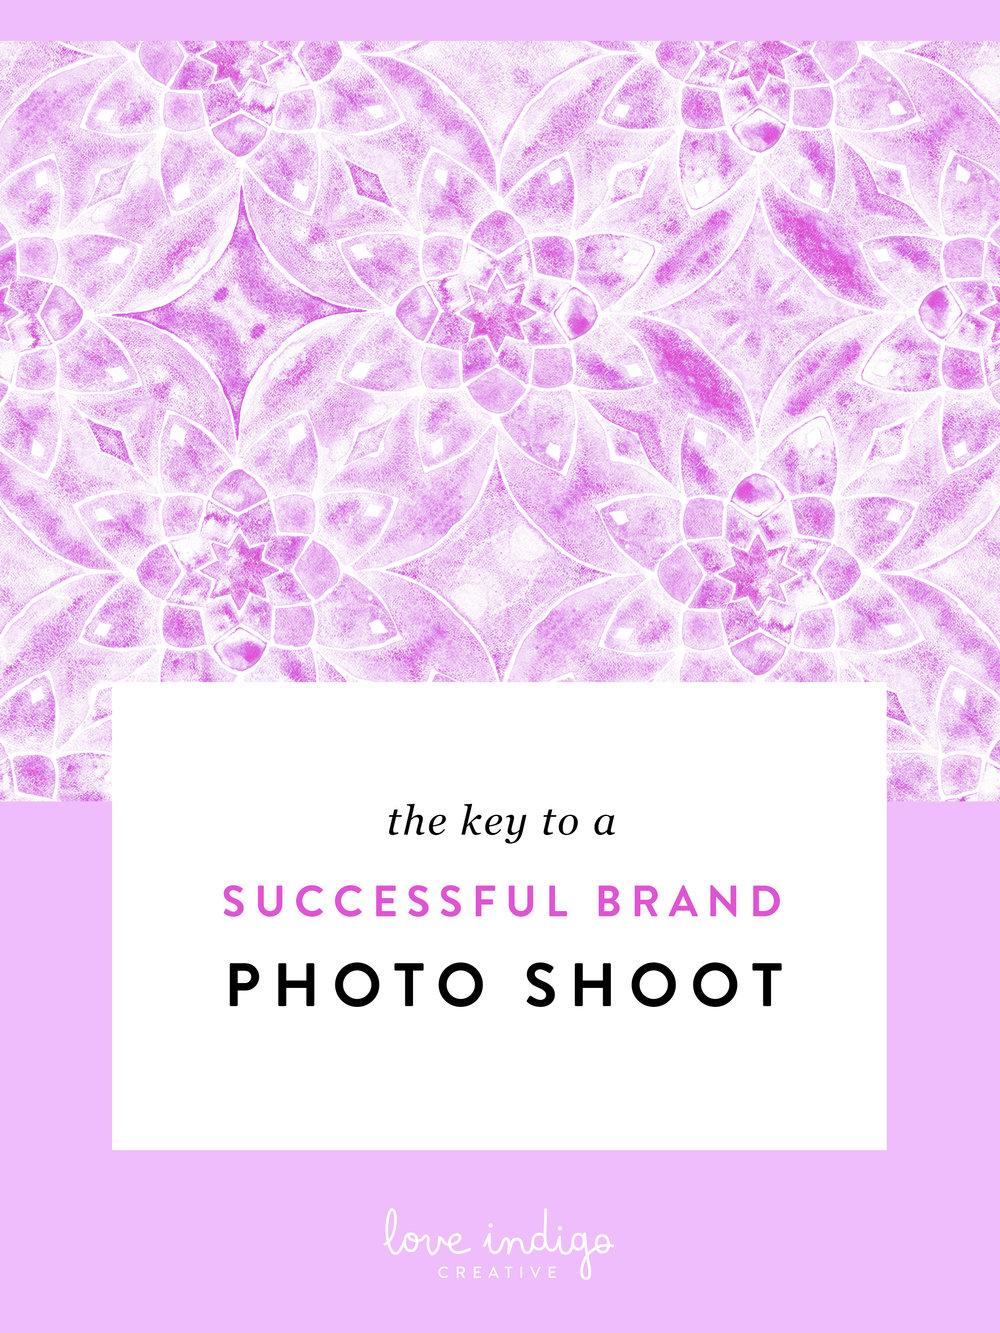 The Key to a Successful Brand Photo Shoot | Love Indigo Creative